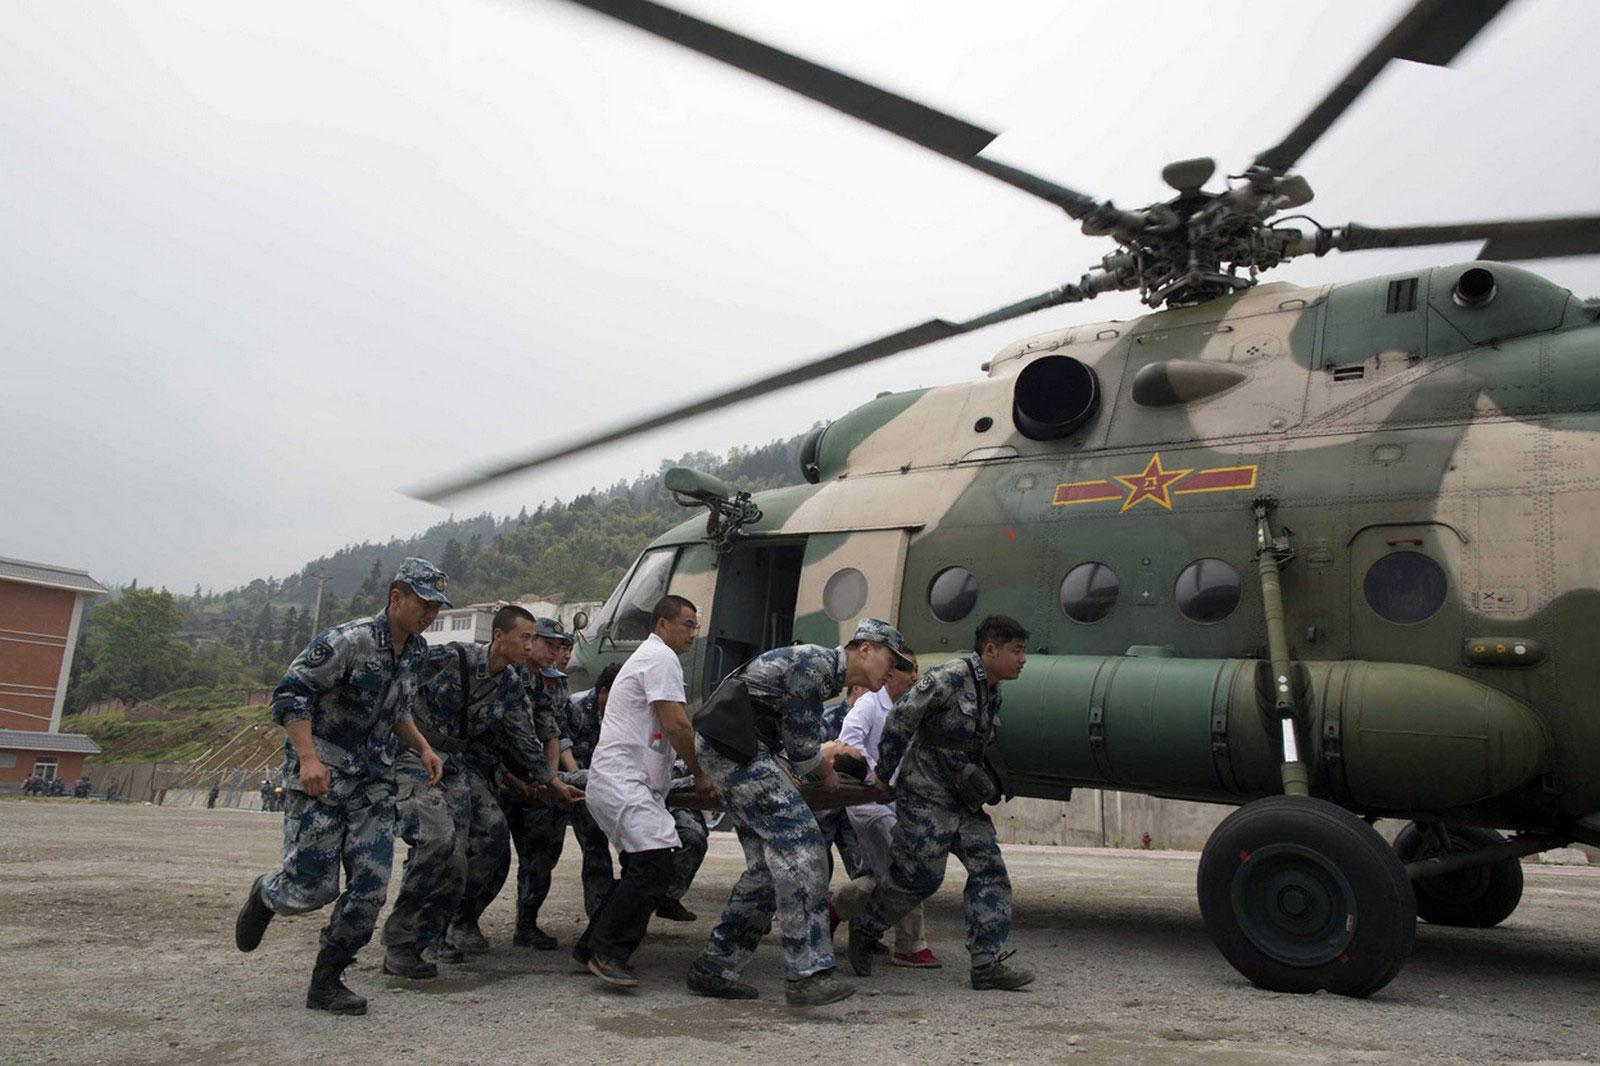 Эвакуация тяжело раненых